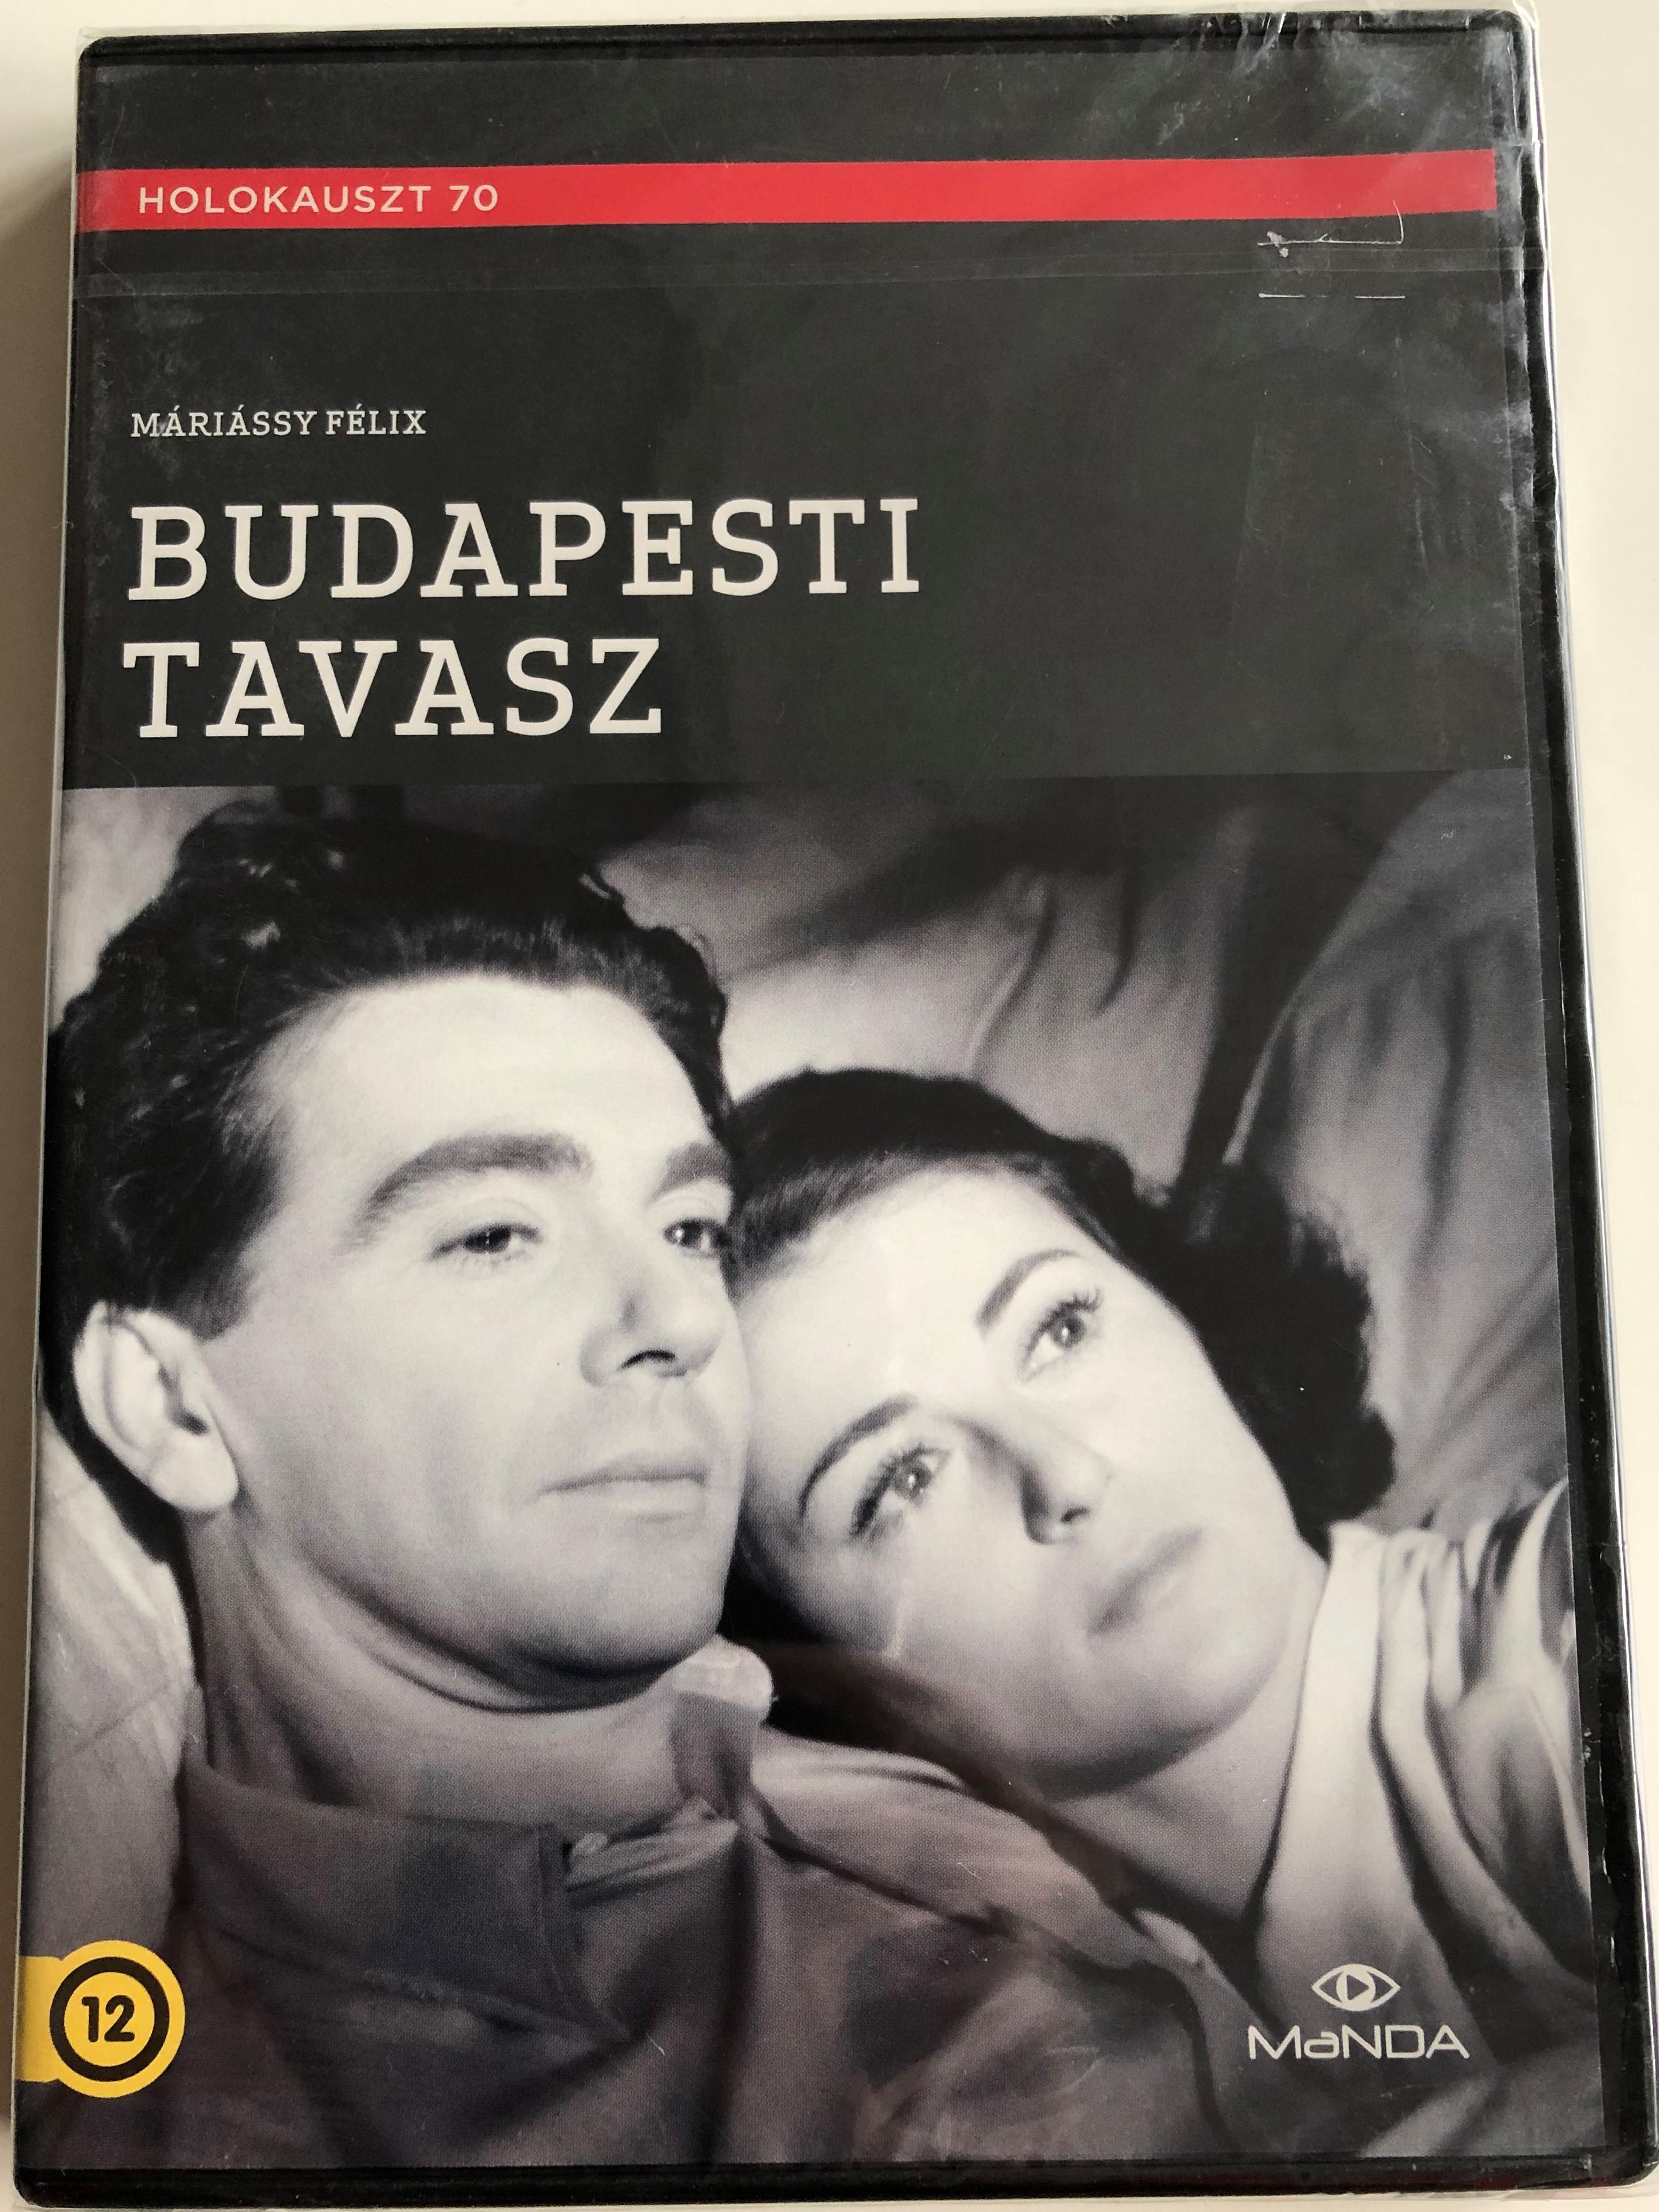 budapesti-tavasz-dvd-1955-budapest-spring-directed-by-m-ri-ssy-f-lix-1.jpg